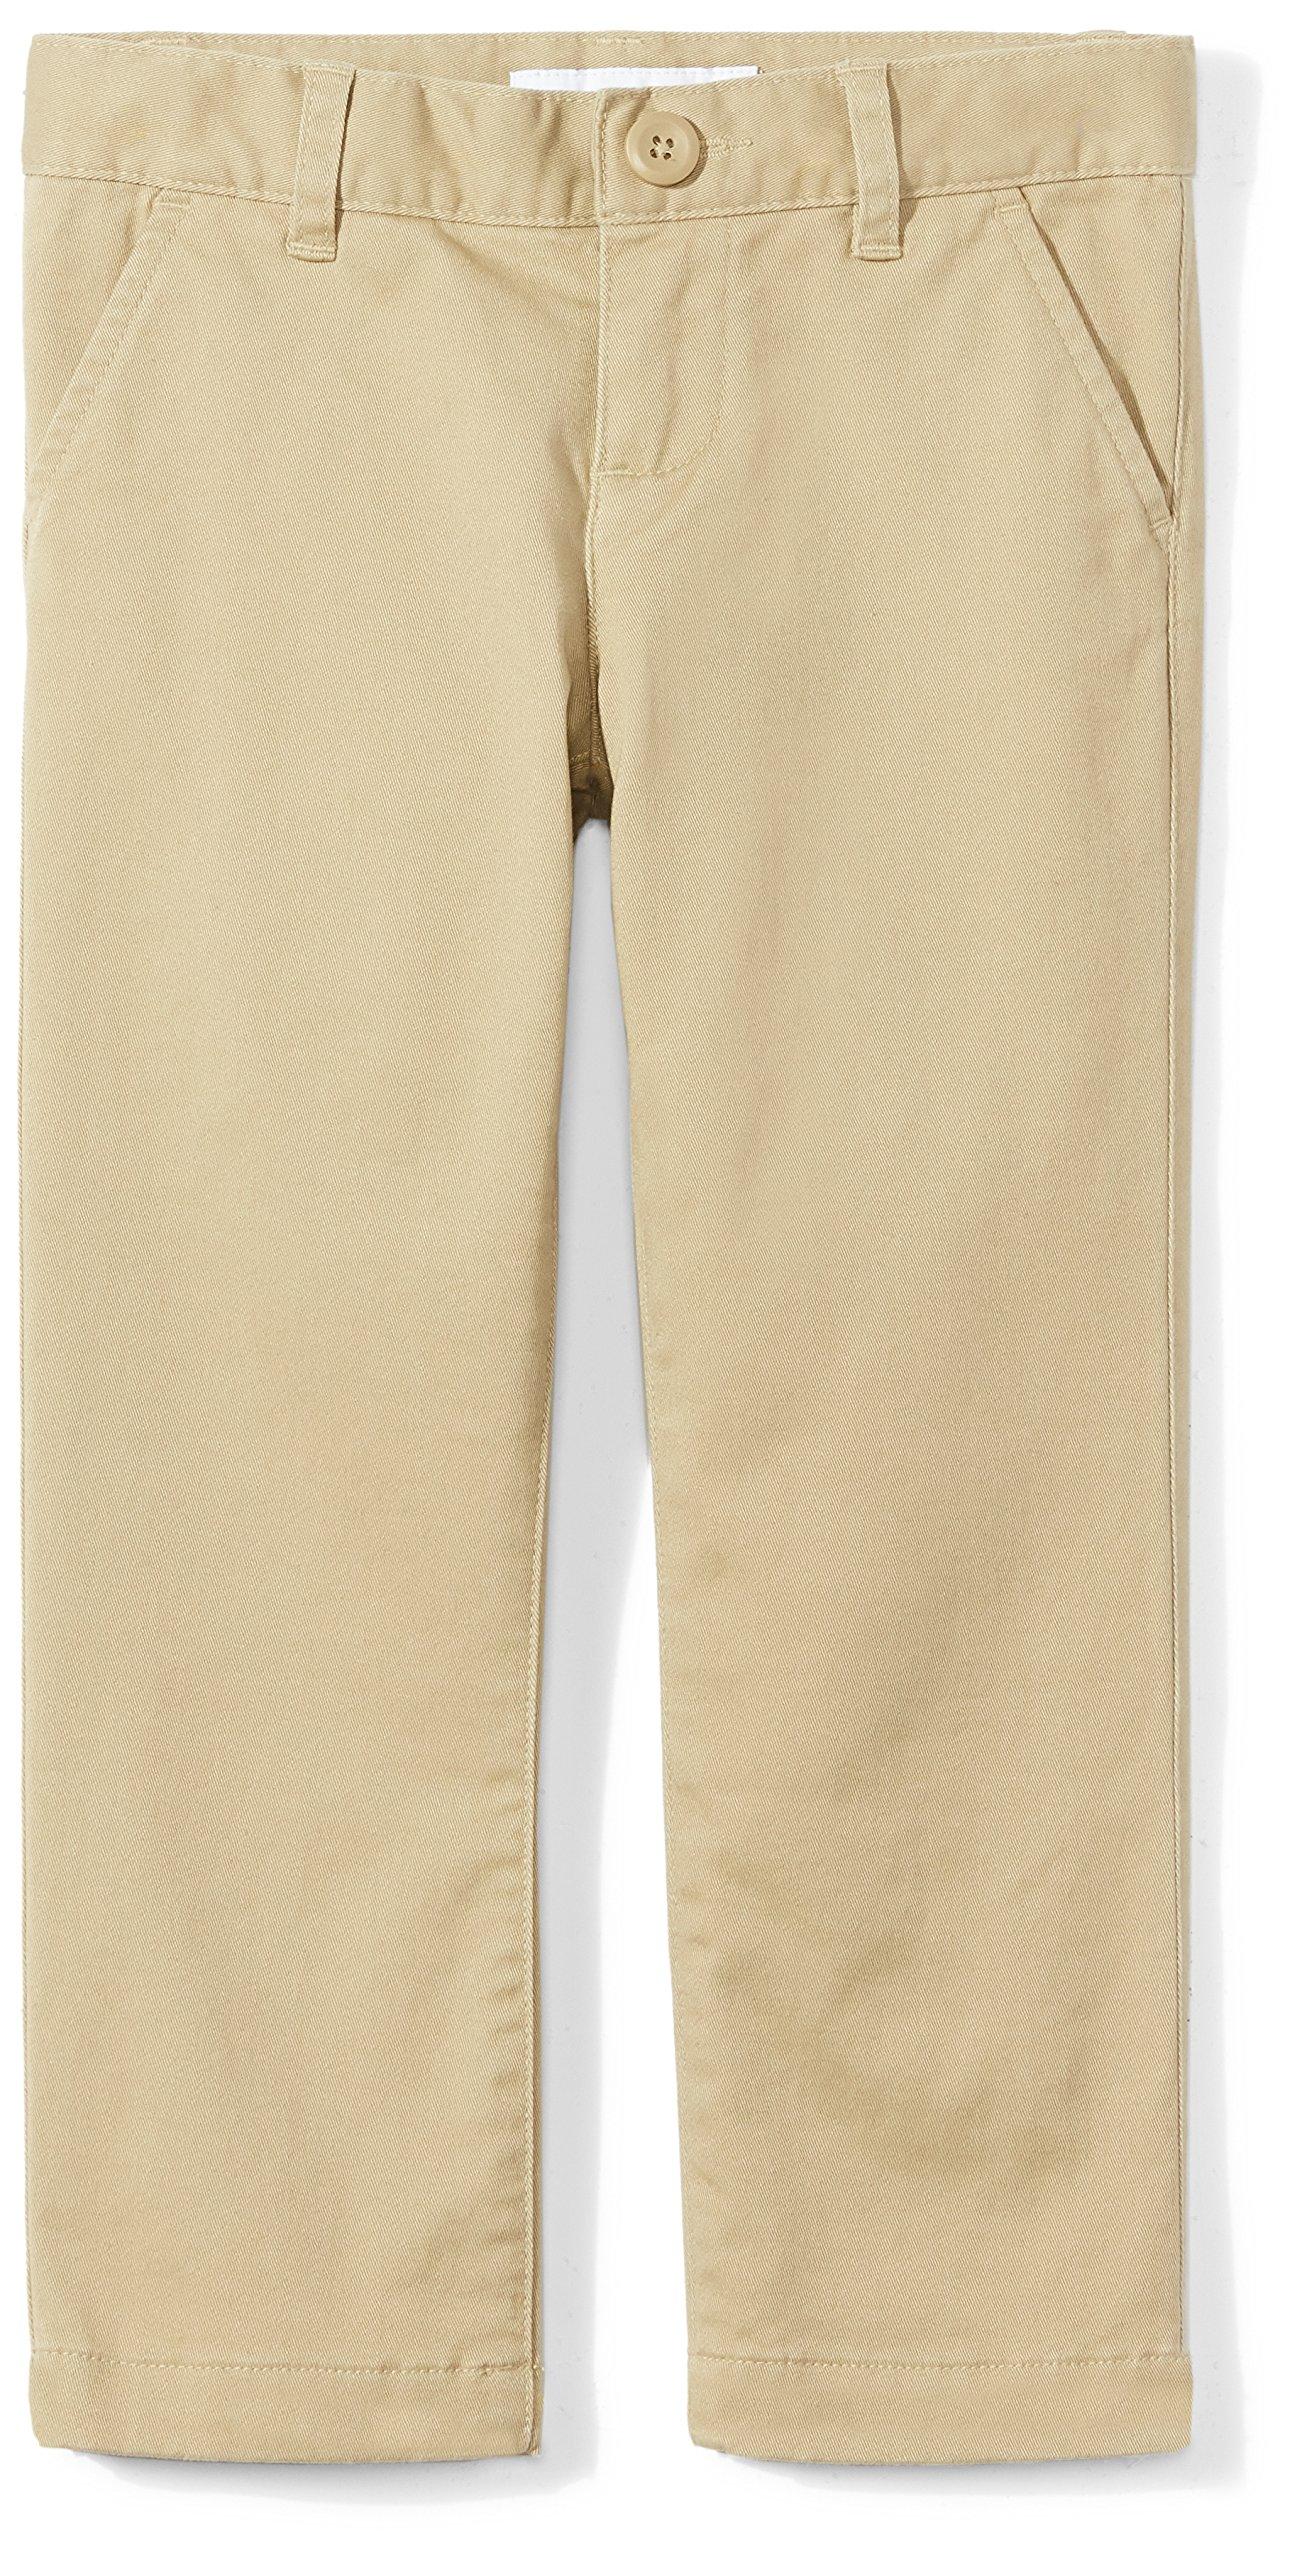 Amazon Essentials Girls' Flat Front Uniform Chino Pant, Khaki,6